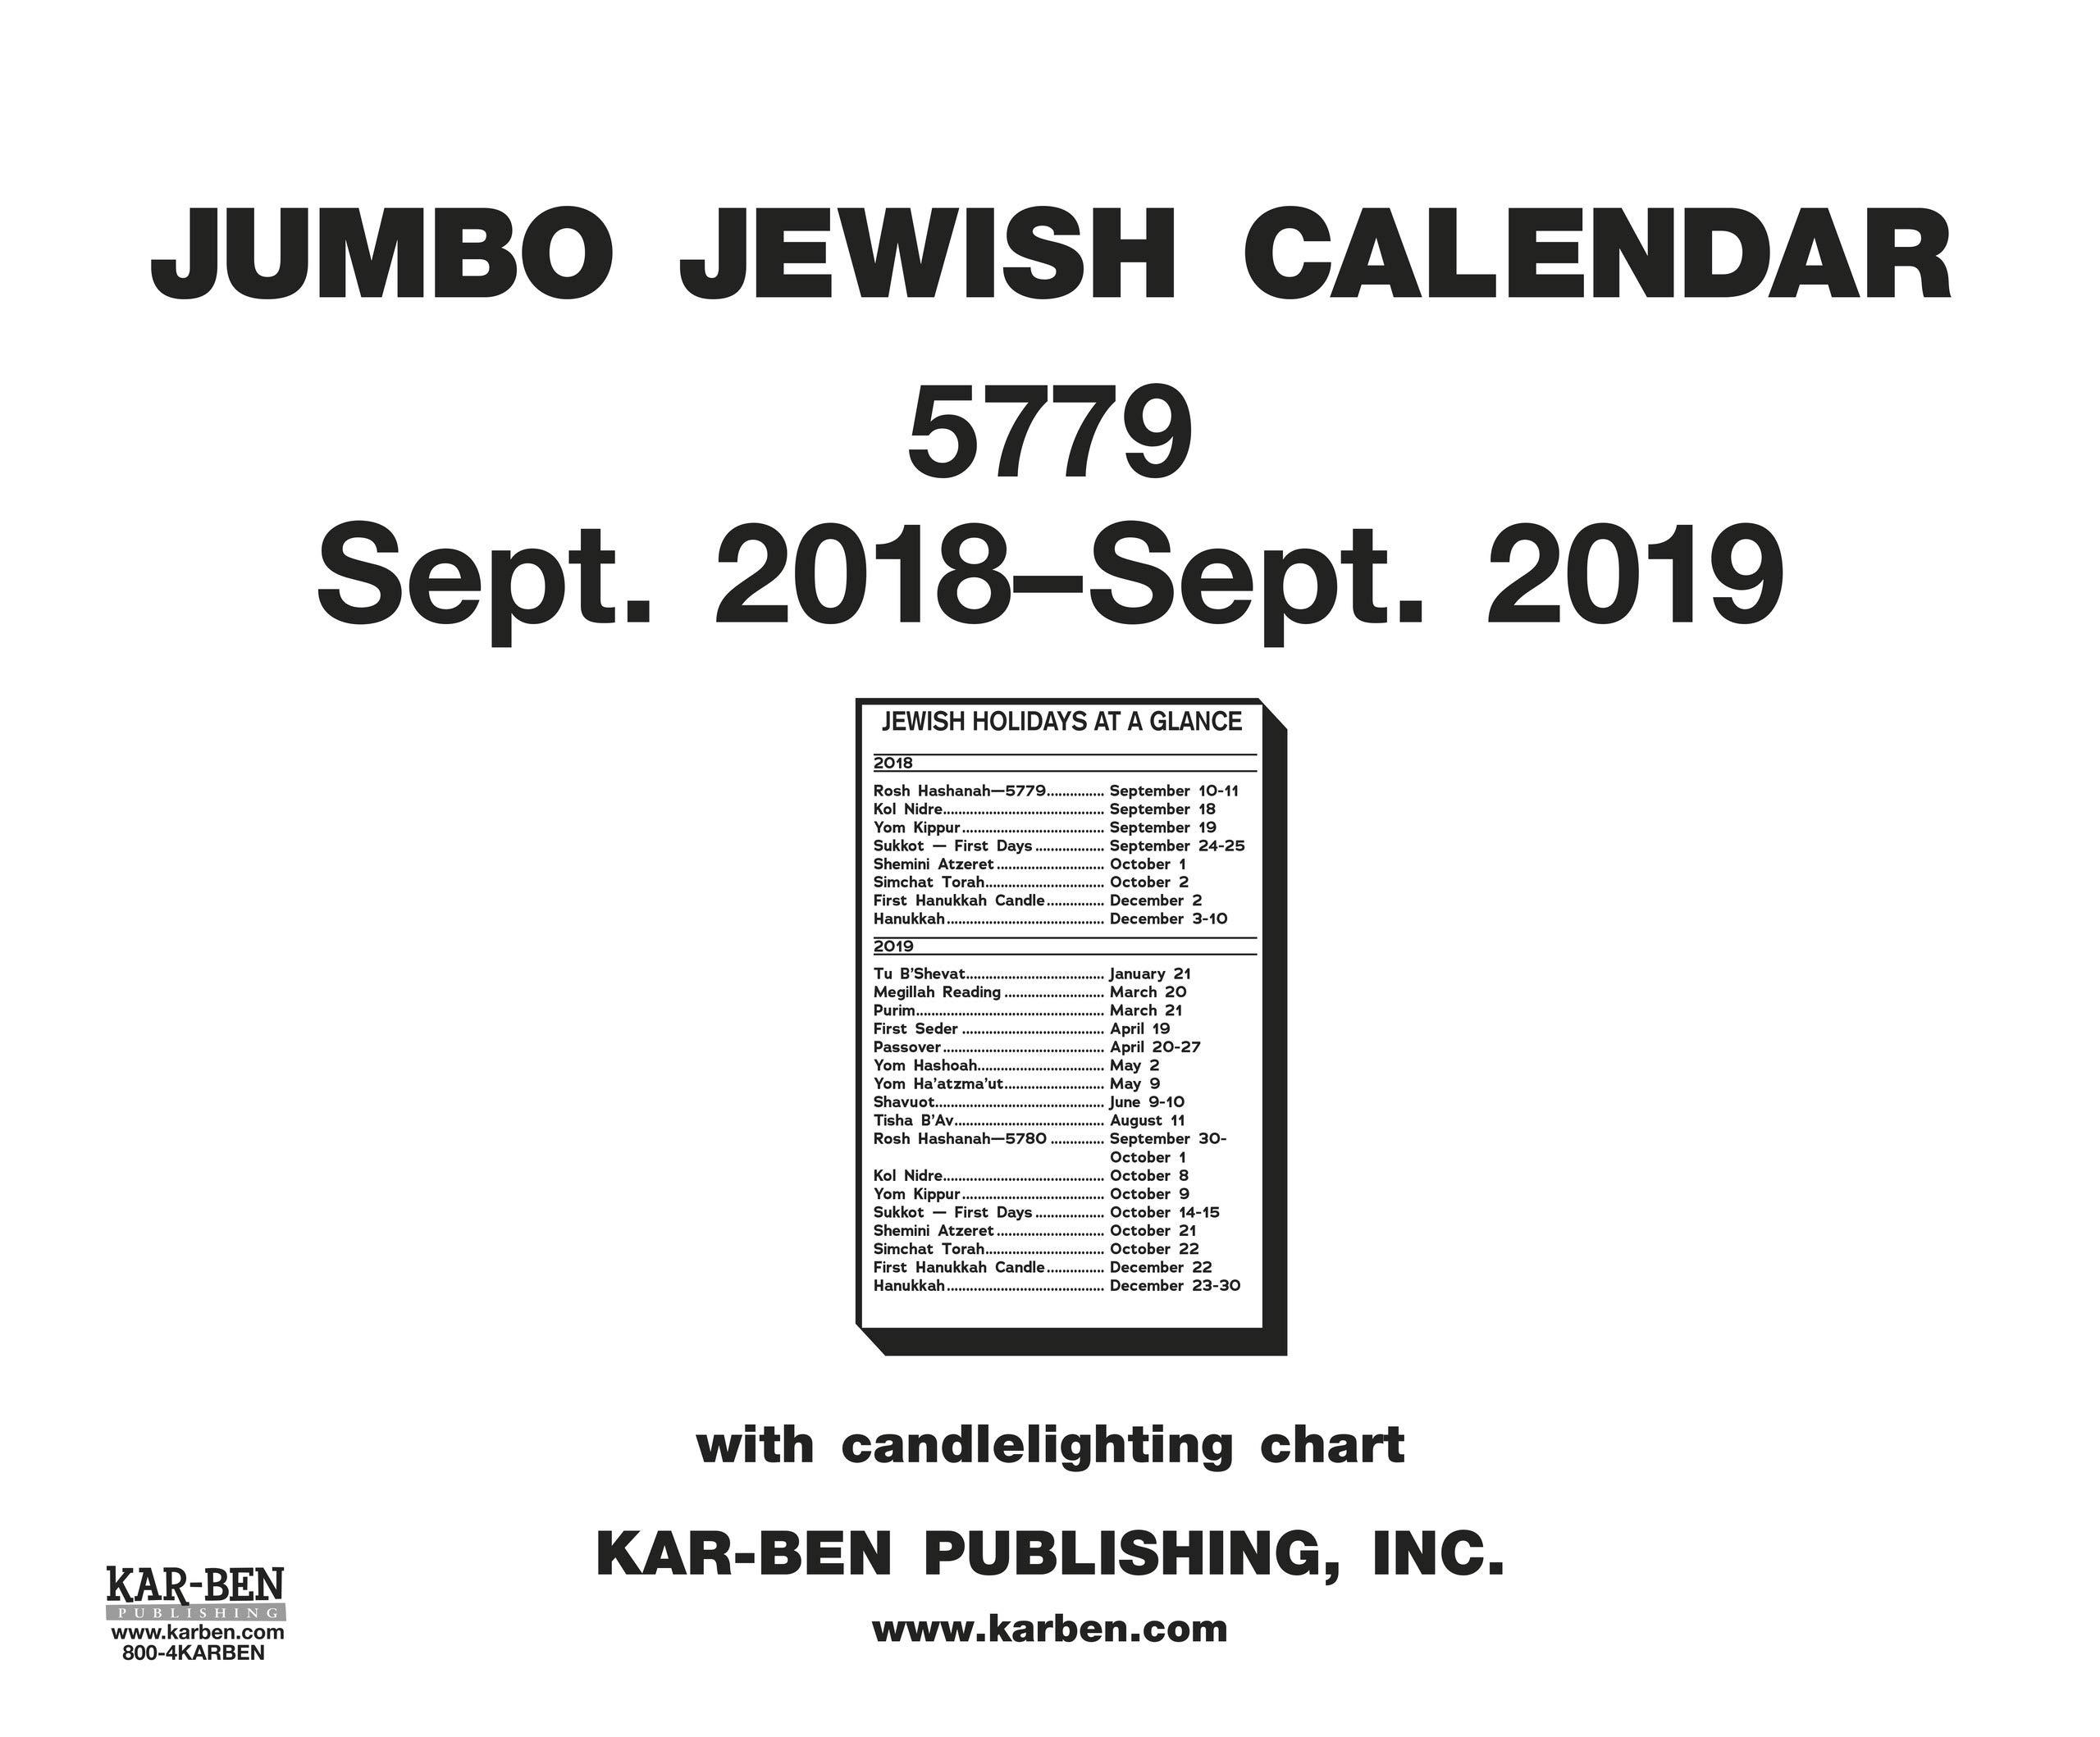 Jumbo Jewish Calendar 5779 Multple 9781541527249 Amazon Com Books